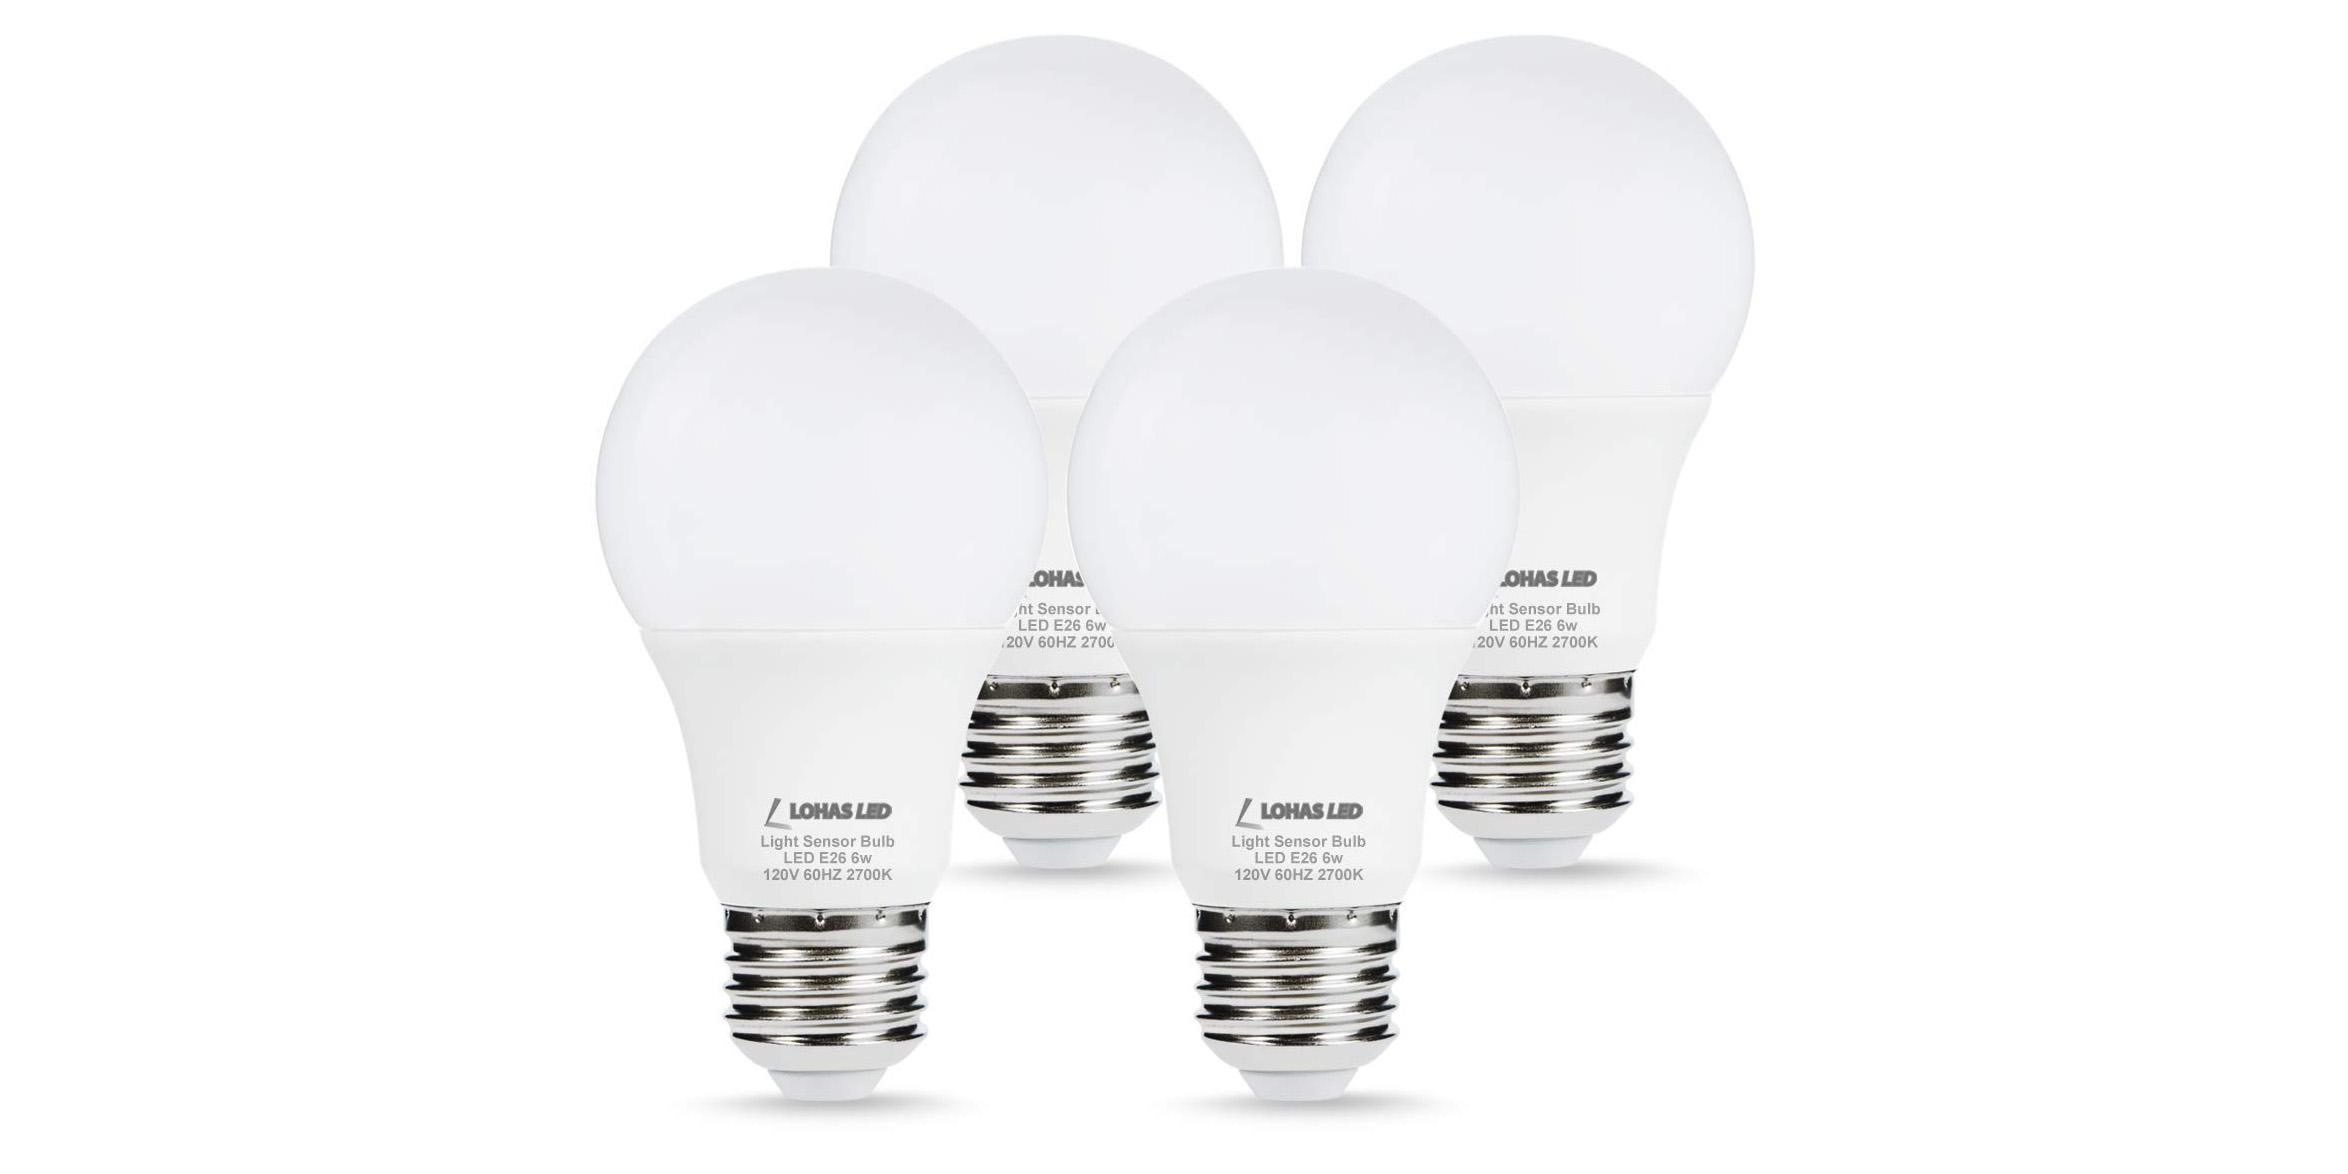 Green Deals: 4-pack 40W Smart Sensor LED Light Bulbs $13, more